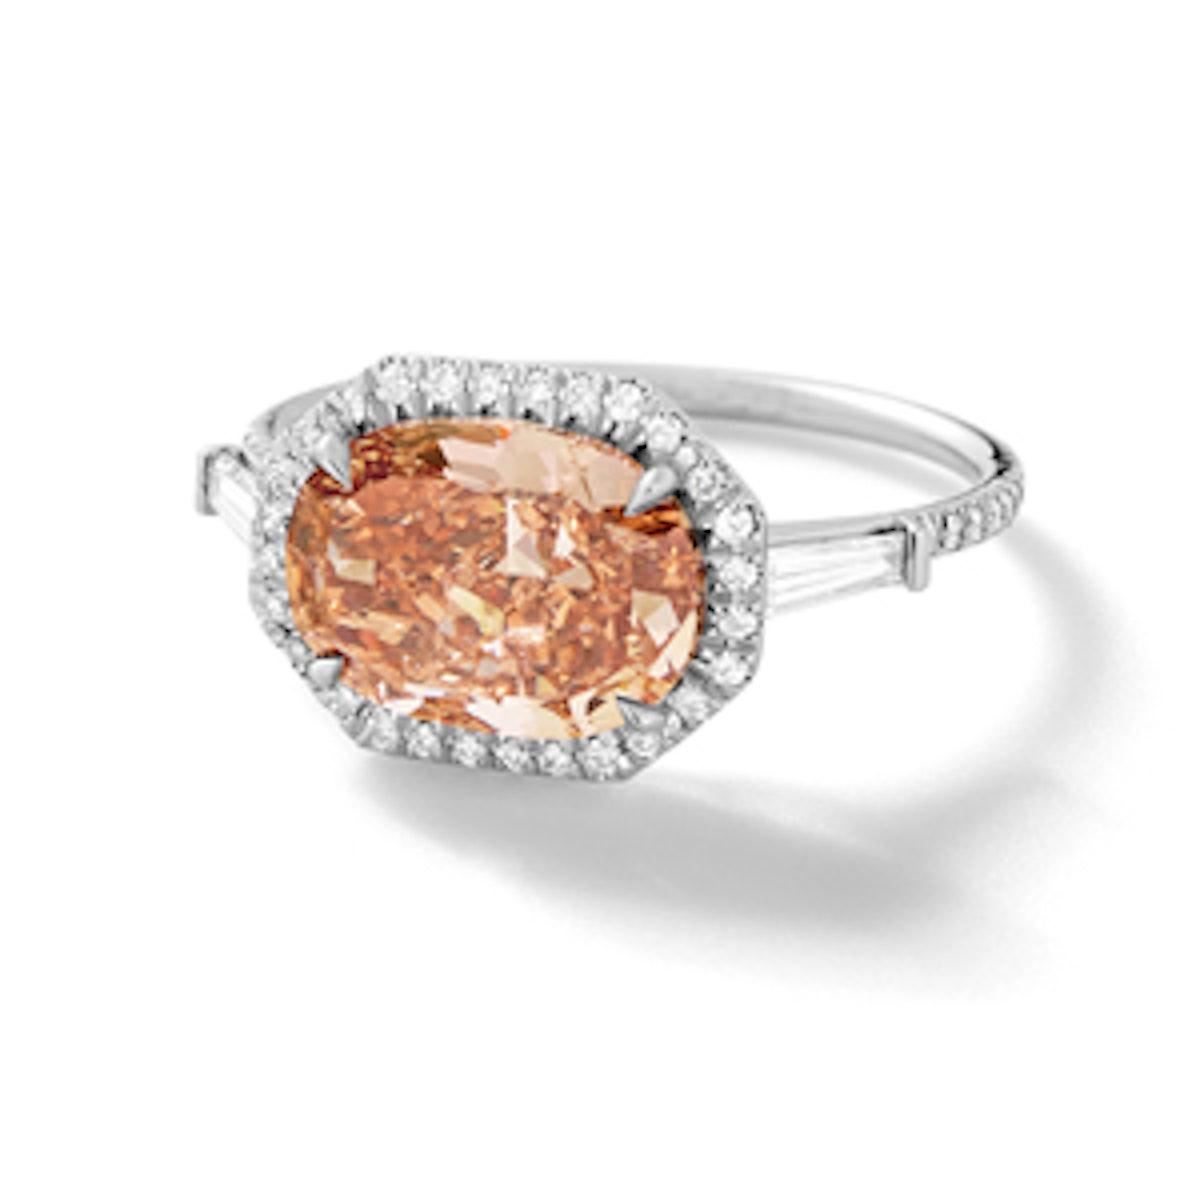 Oval Brilliant Cut Pink Diamond With Diamond Baguettes